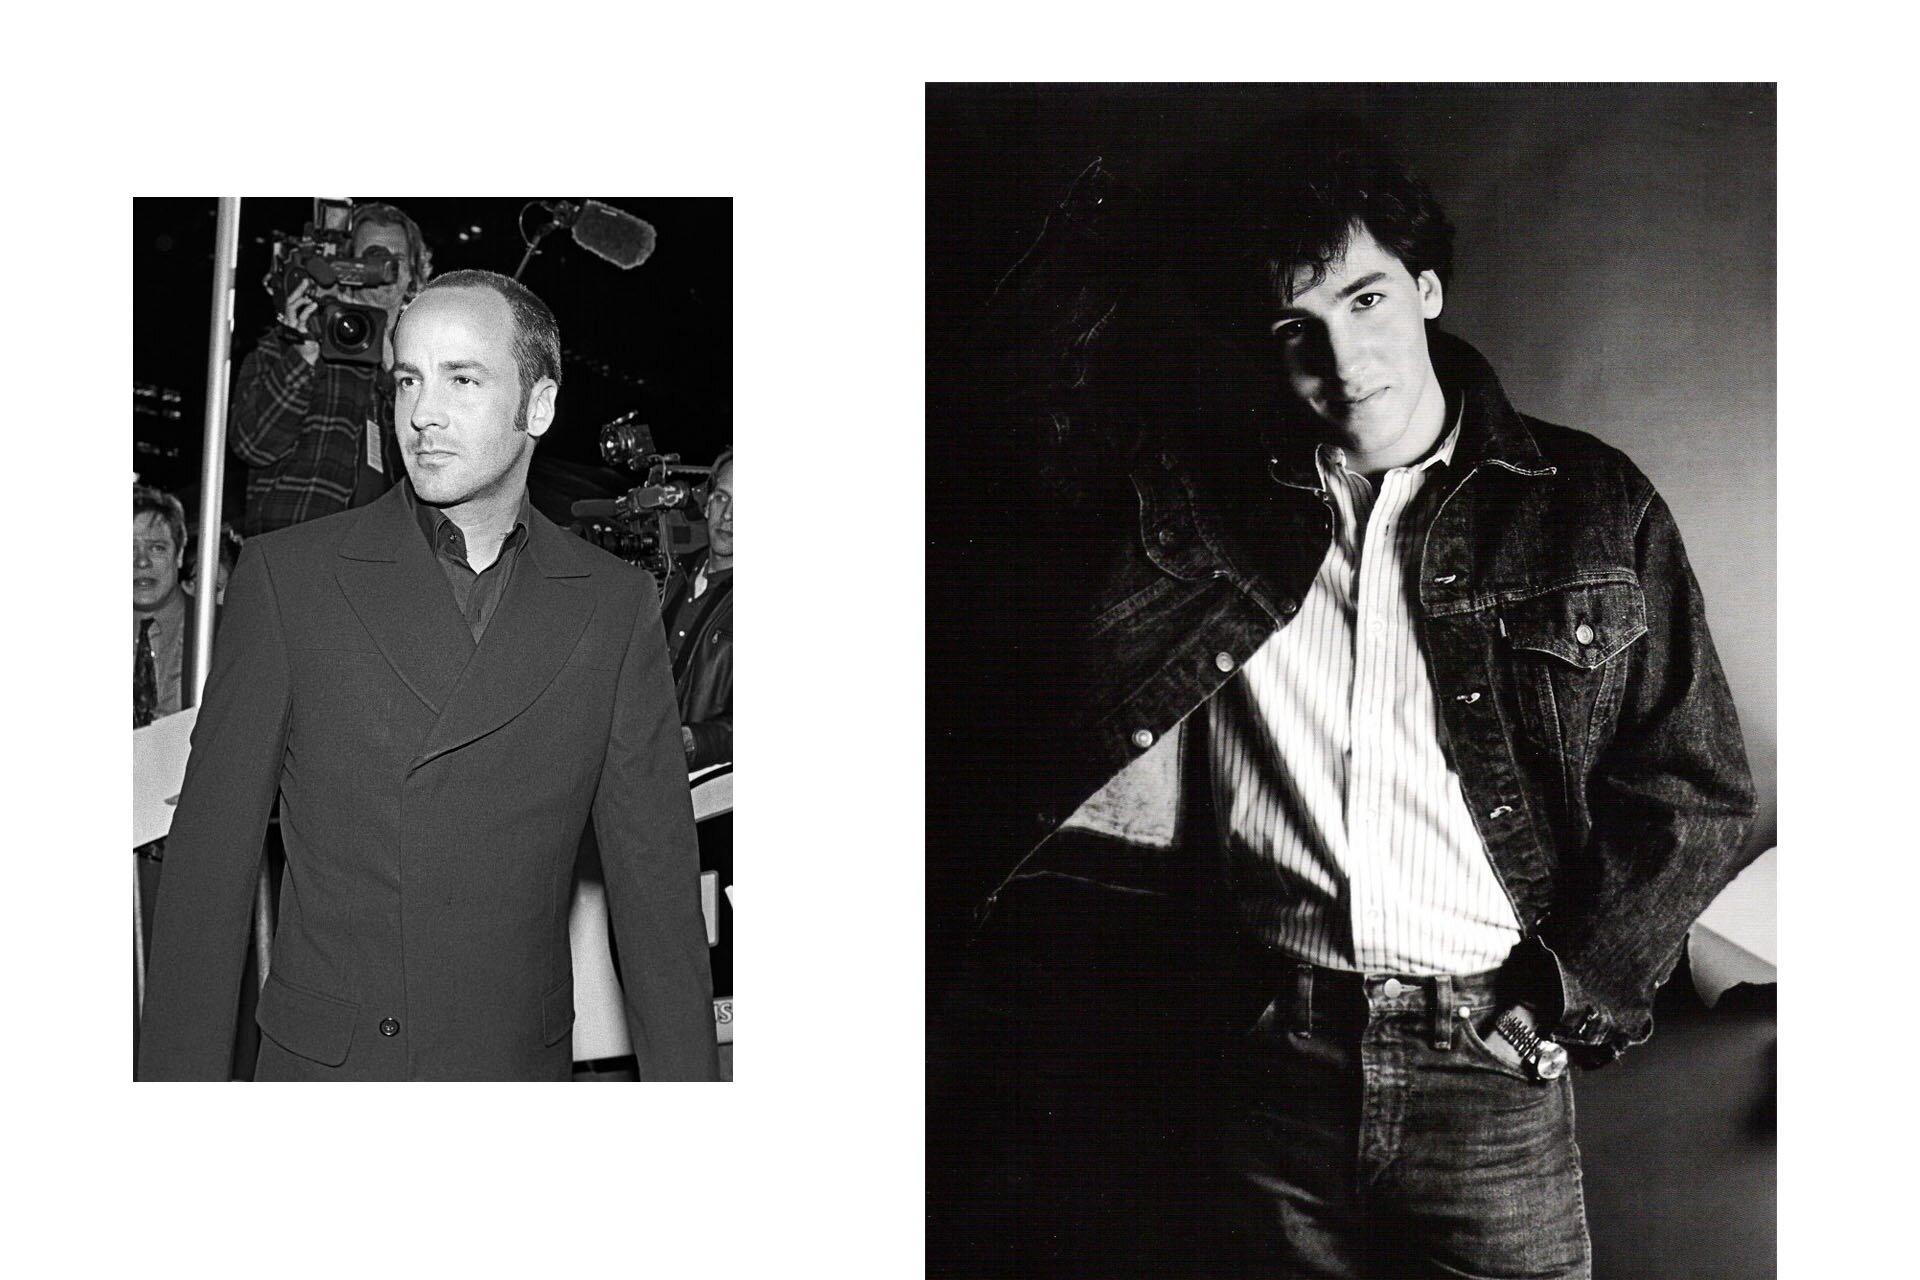 Yves Saint Laurent, Najsłynniejsi projektanci, Francuska moda, Haute Couture, Tom Ford